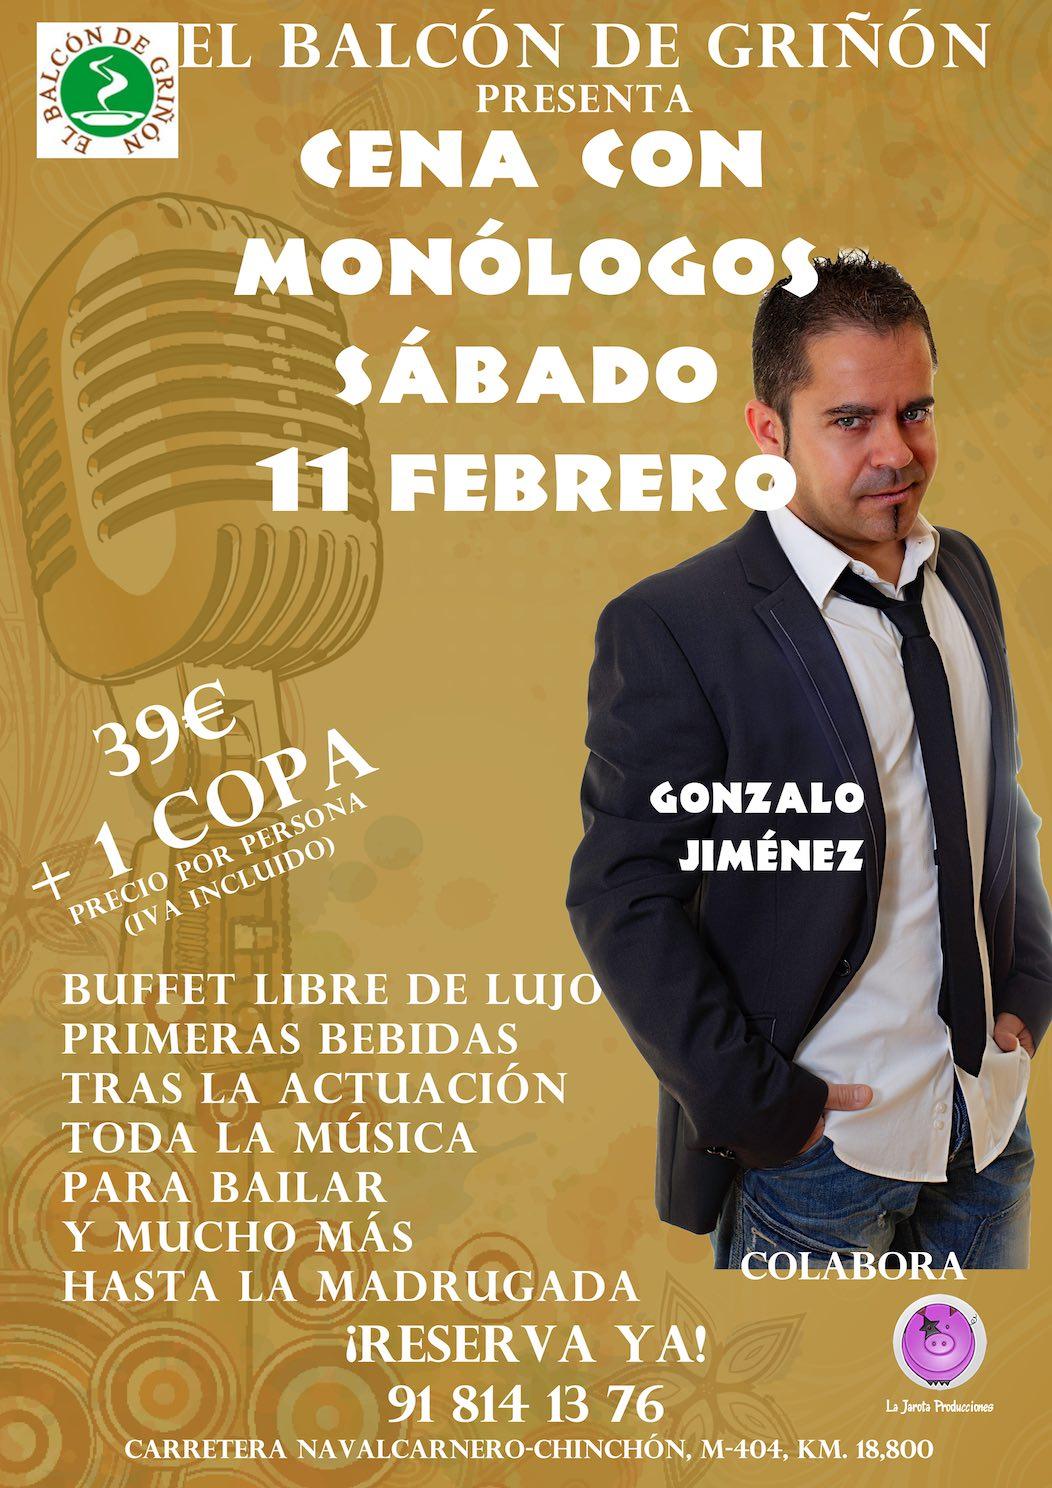 Cena con Monólogos en El Balcón de Griñón